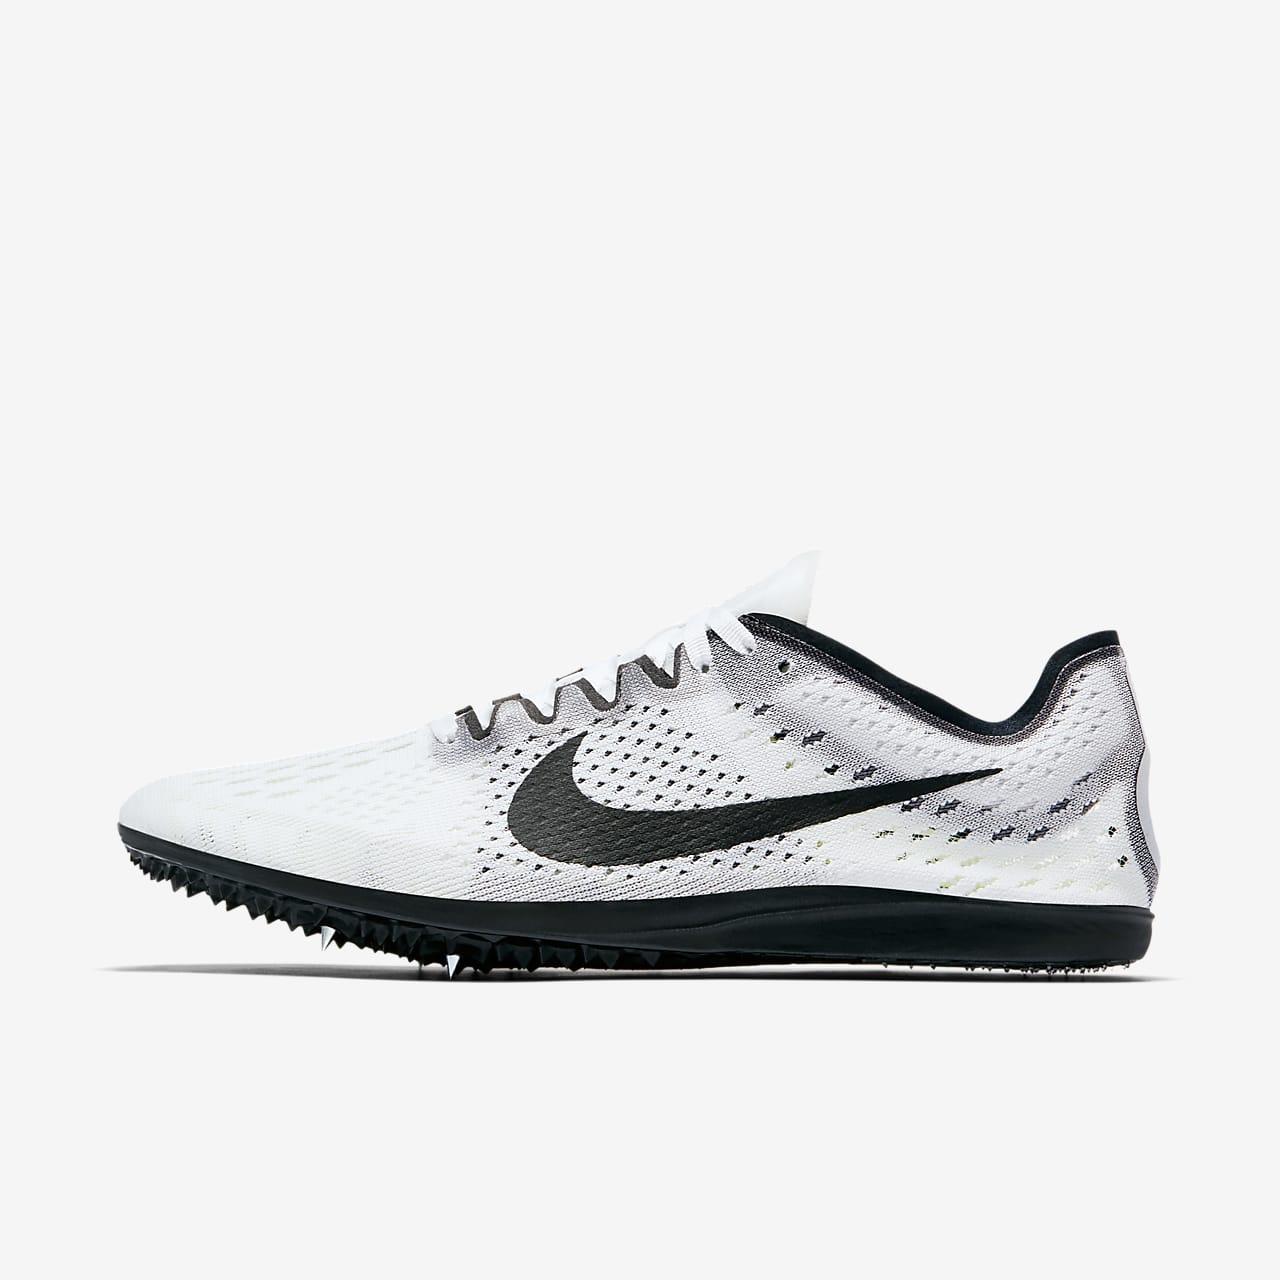 Scarpa chiodata da gara Nike Zoom Matumbo 3